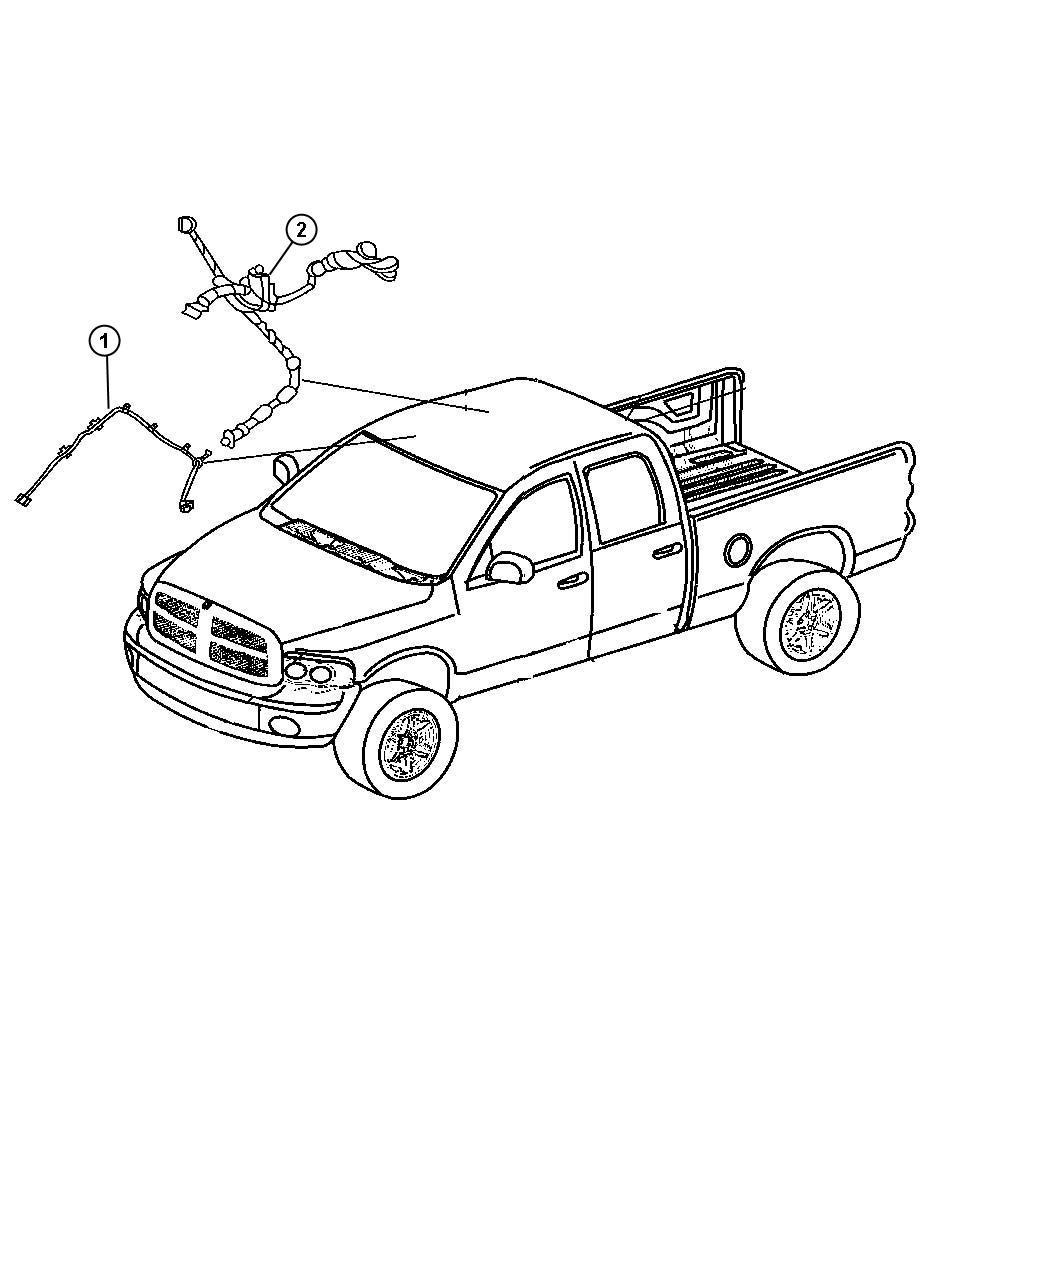 Ram Wiring Header Hybrid Electric Vehicle